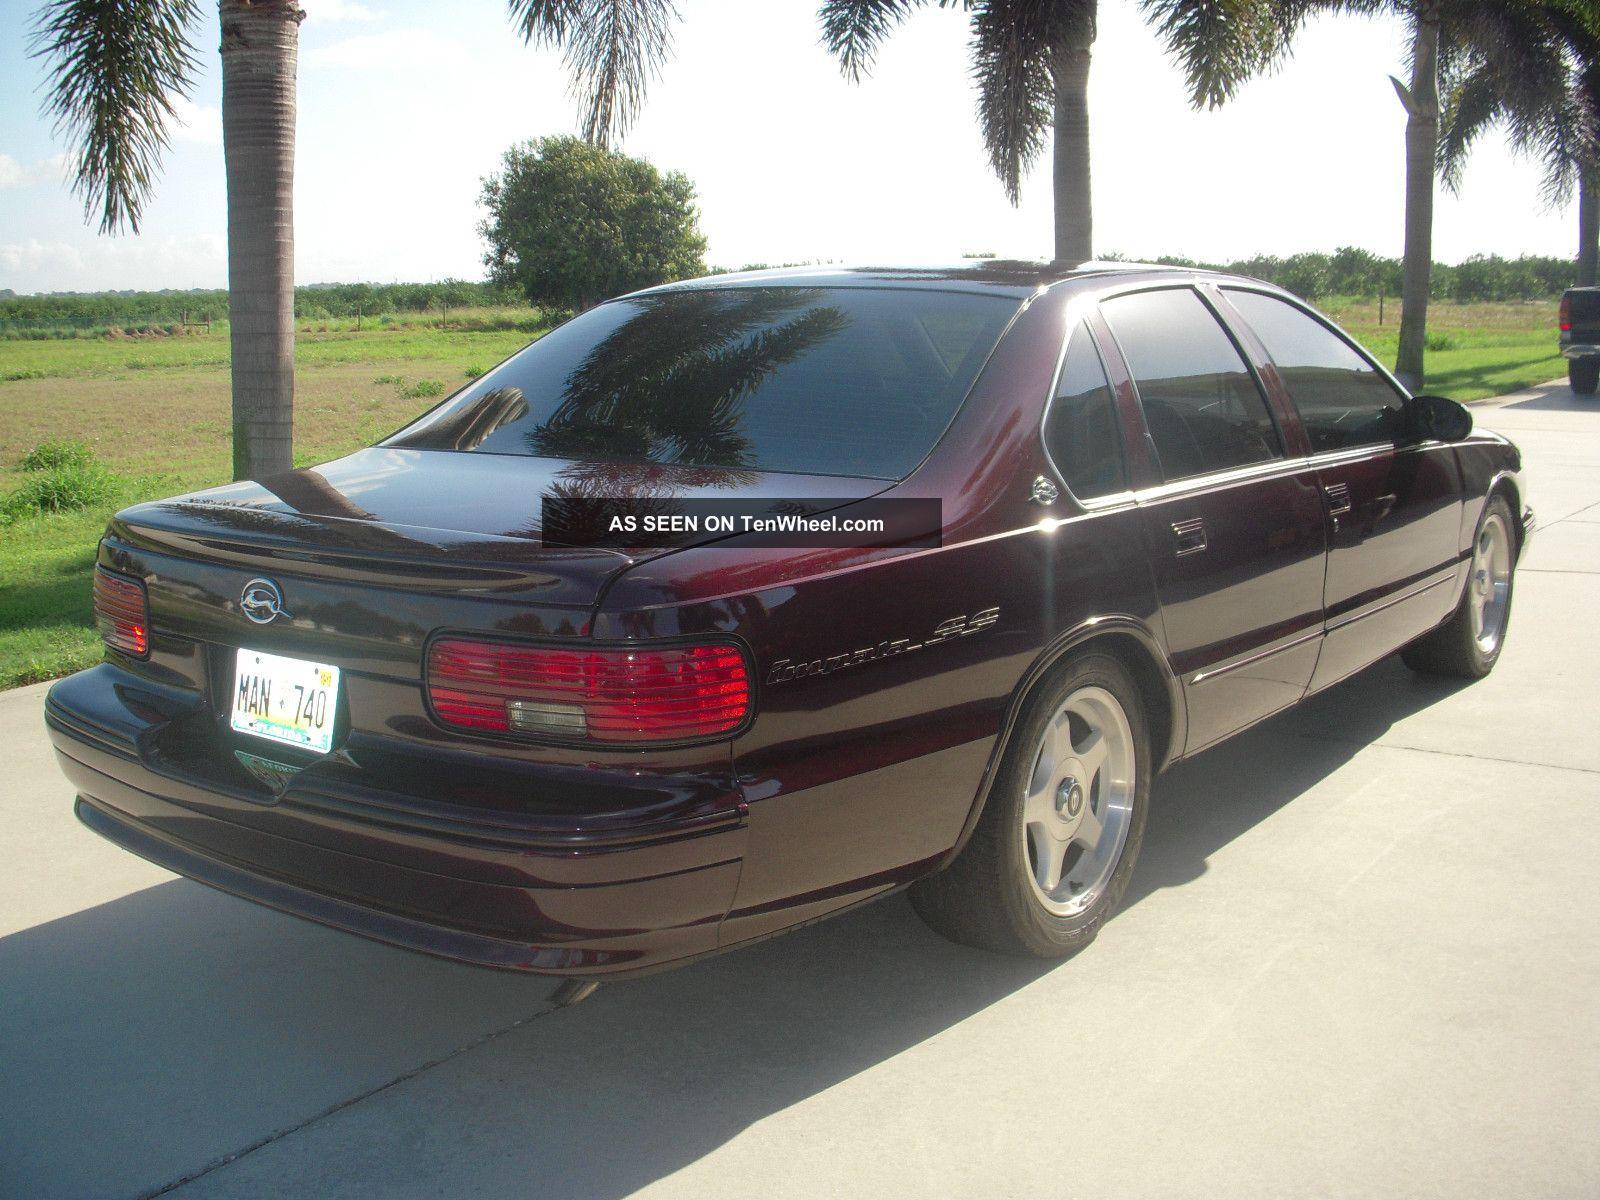 1996 chevrolet impala ss sedan 4 door 5 7l. Black Bedroom Furniture Sets. Home Design Ideas